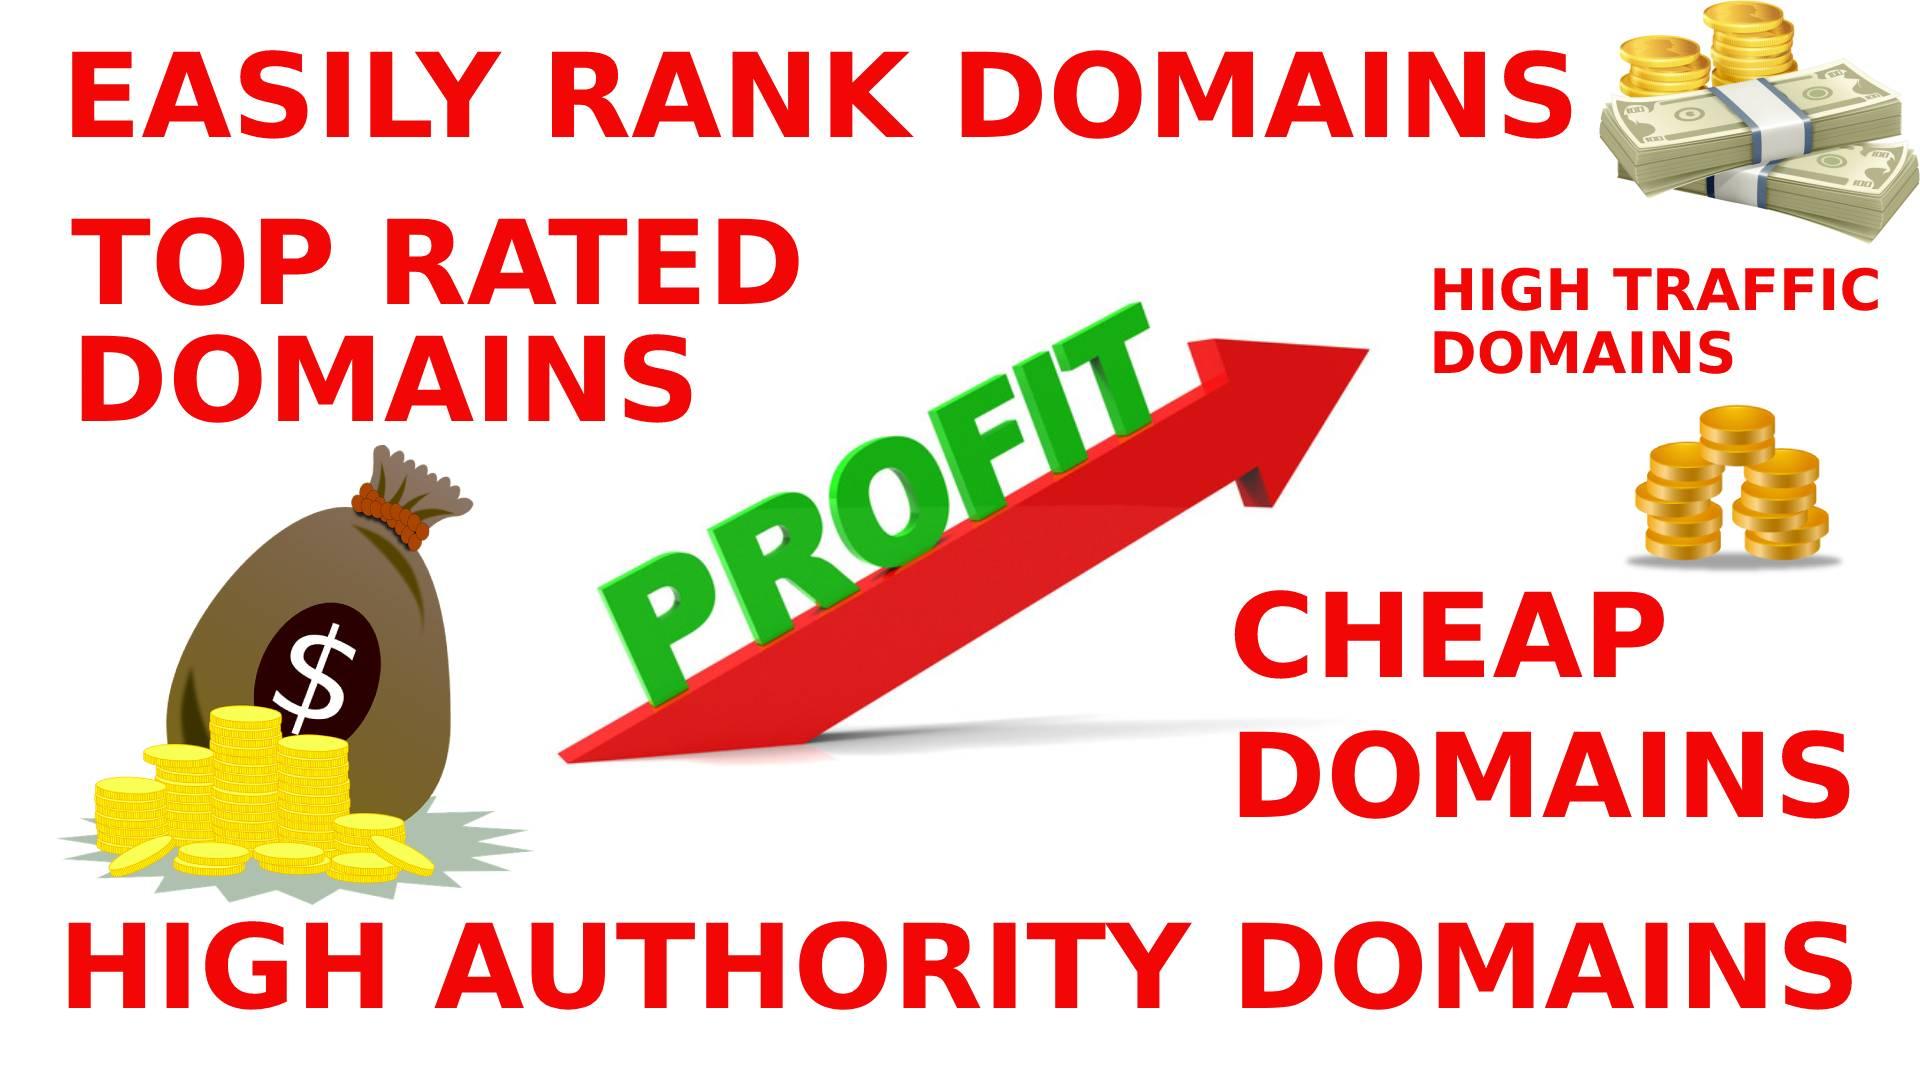 Buy Easily Rank Domains